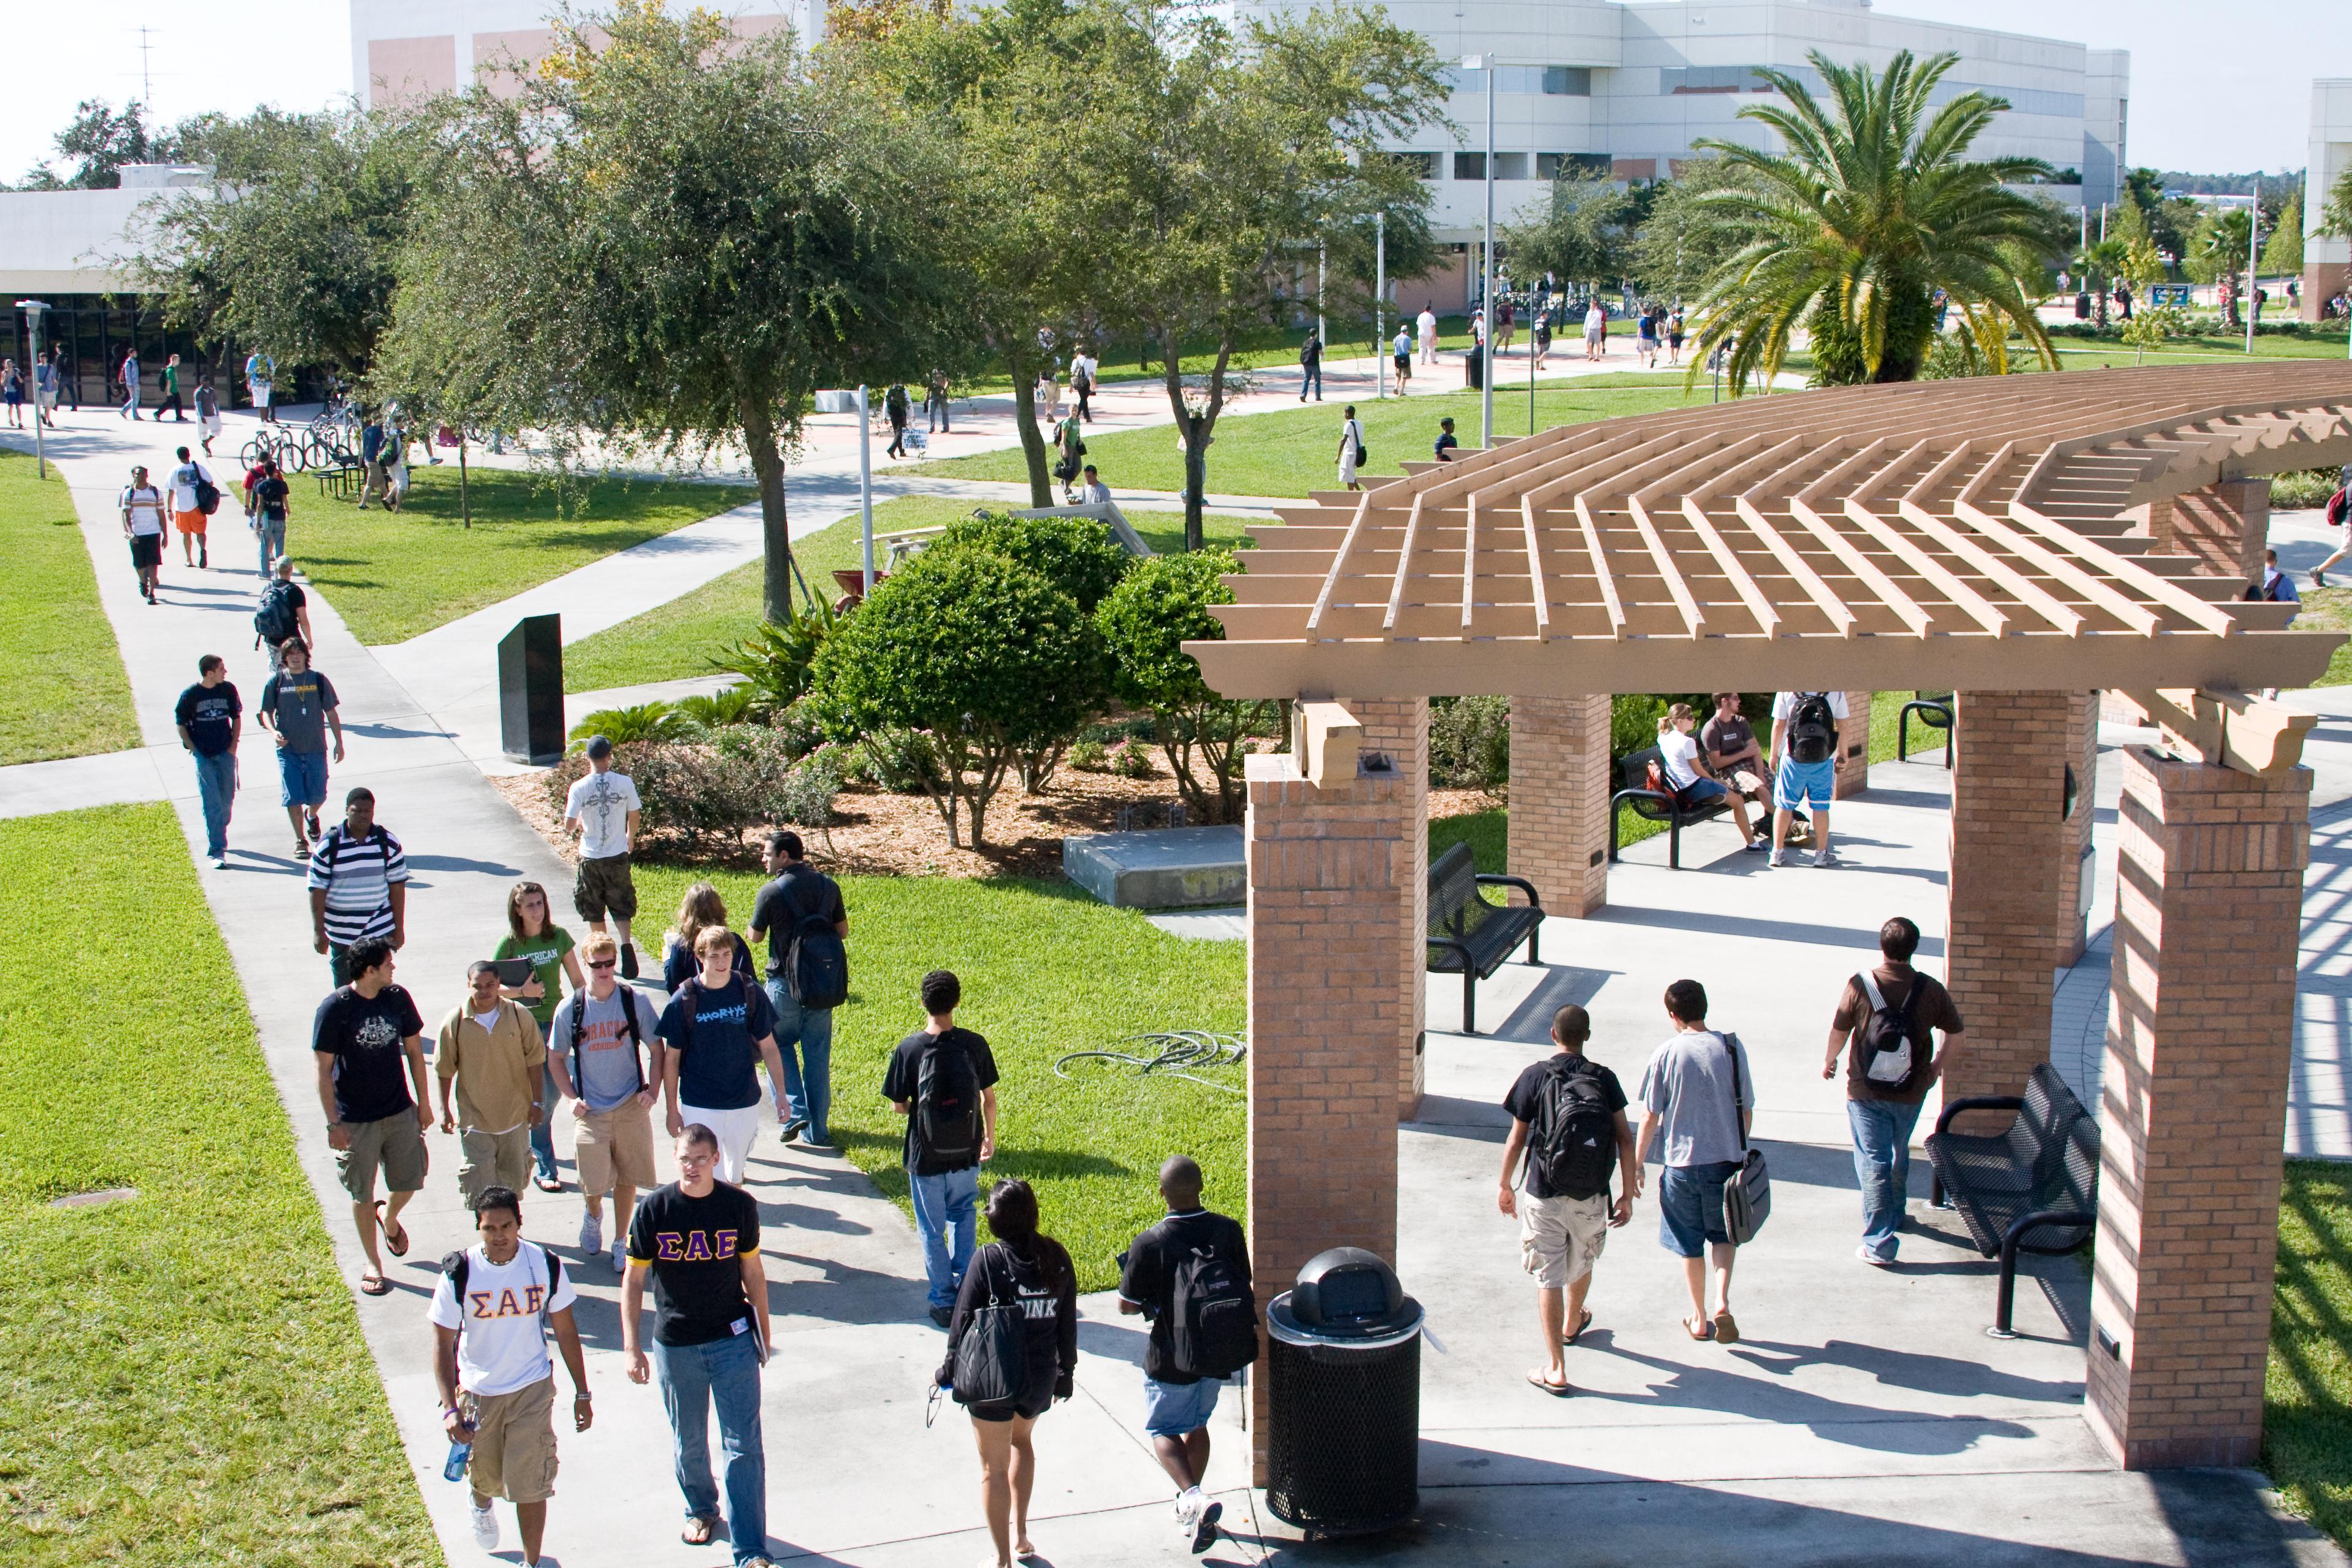 College - Embry-Riddle Aeronautical University (Daytona Beach, Florida)  3